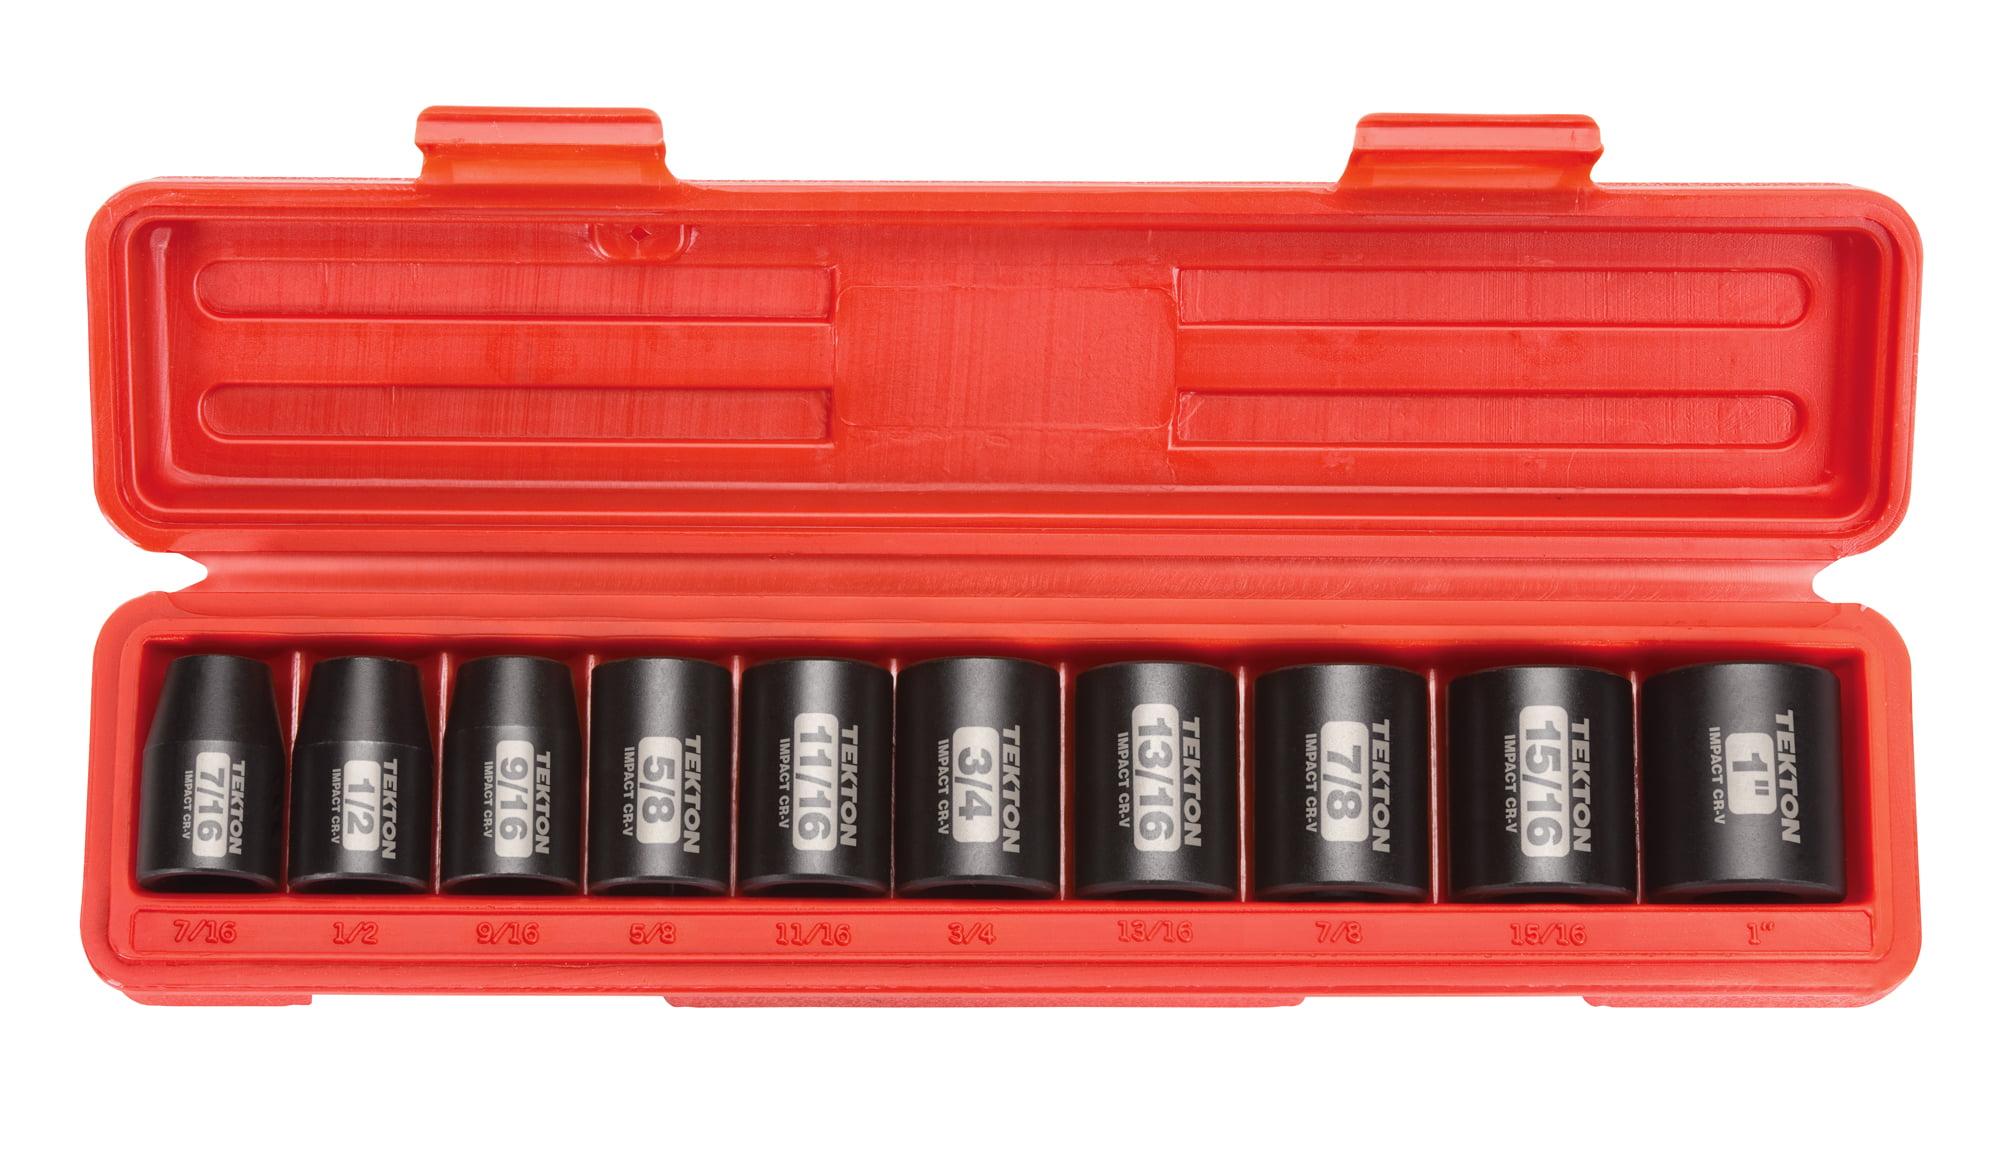 | SID92407 5//16-1-1//4 in., 8-32 mm TEKTON 1//2 Inch Drive 6-Point Impact Socket Set 87-Piece